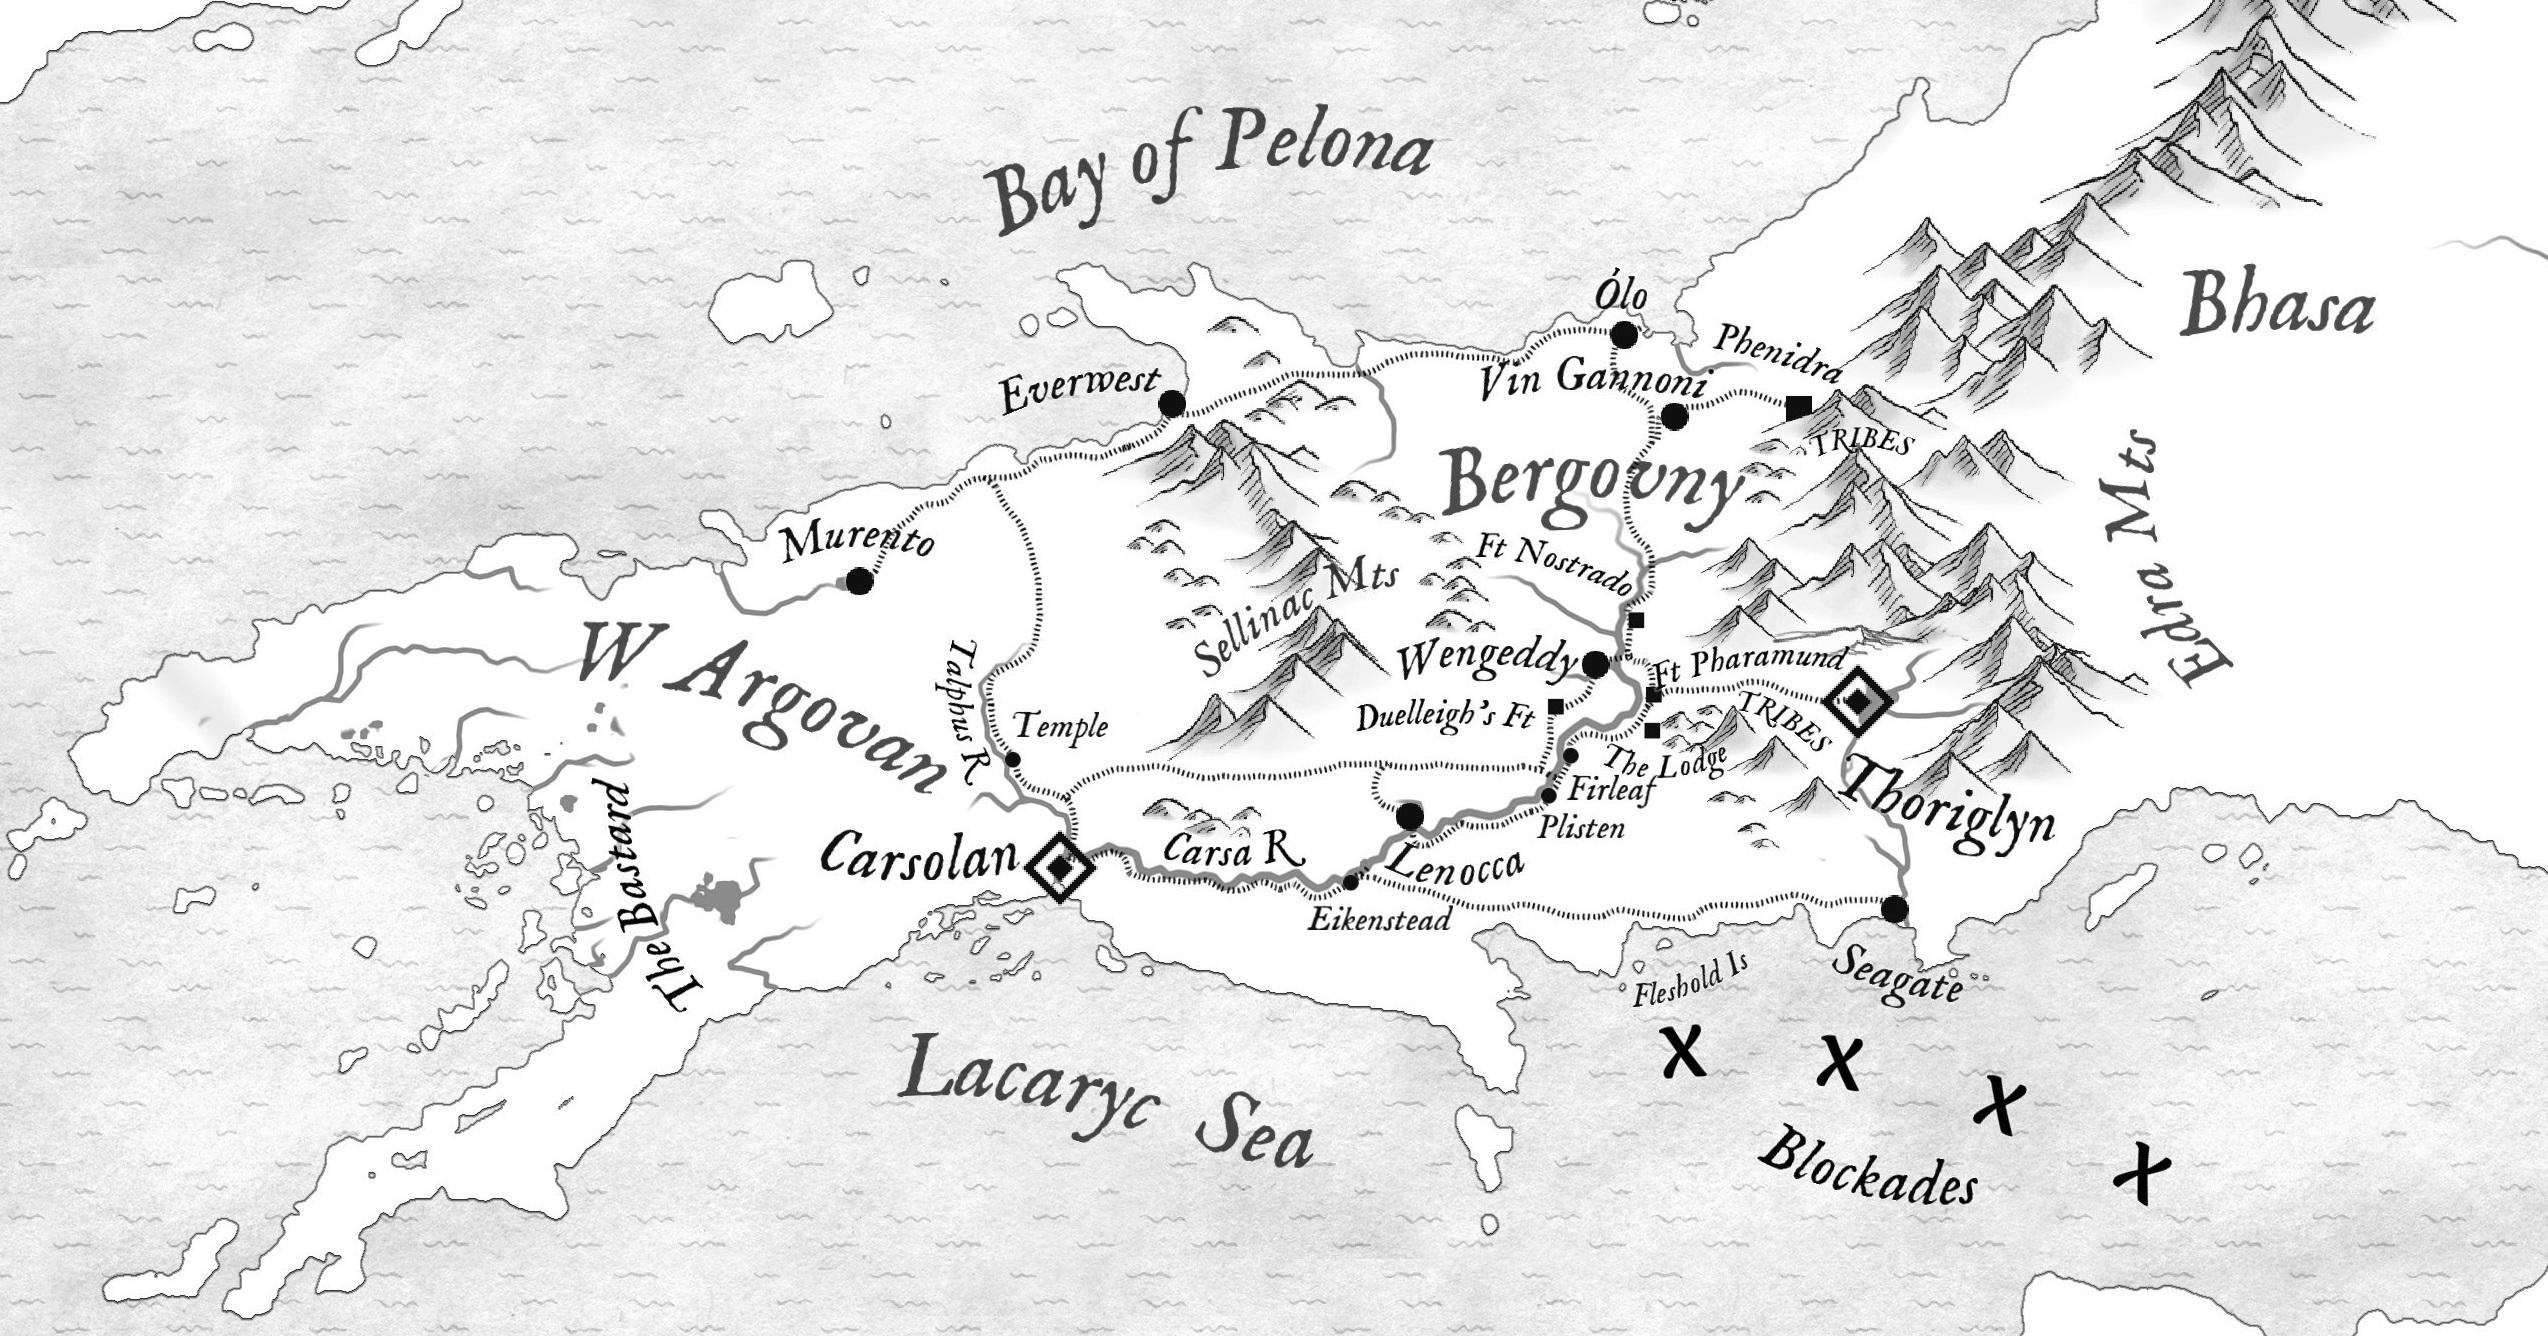 the heron kings map wonderdraft argovan bergovny eric lewis debut fantasy author grimdark